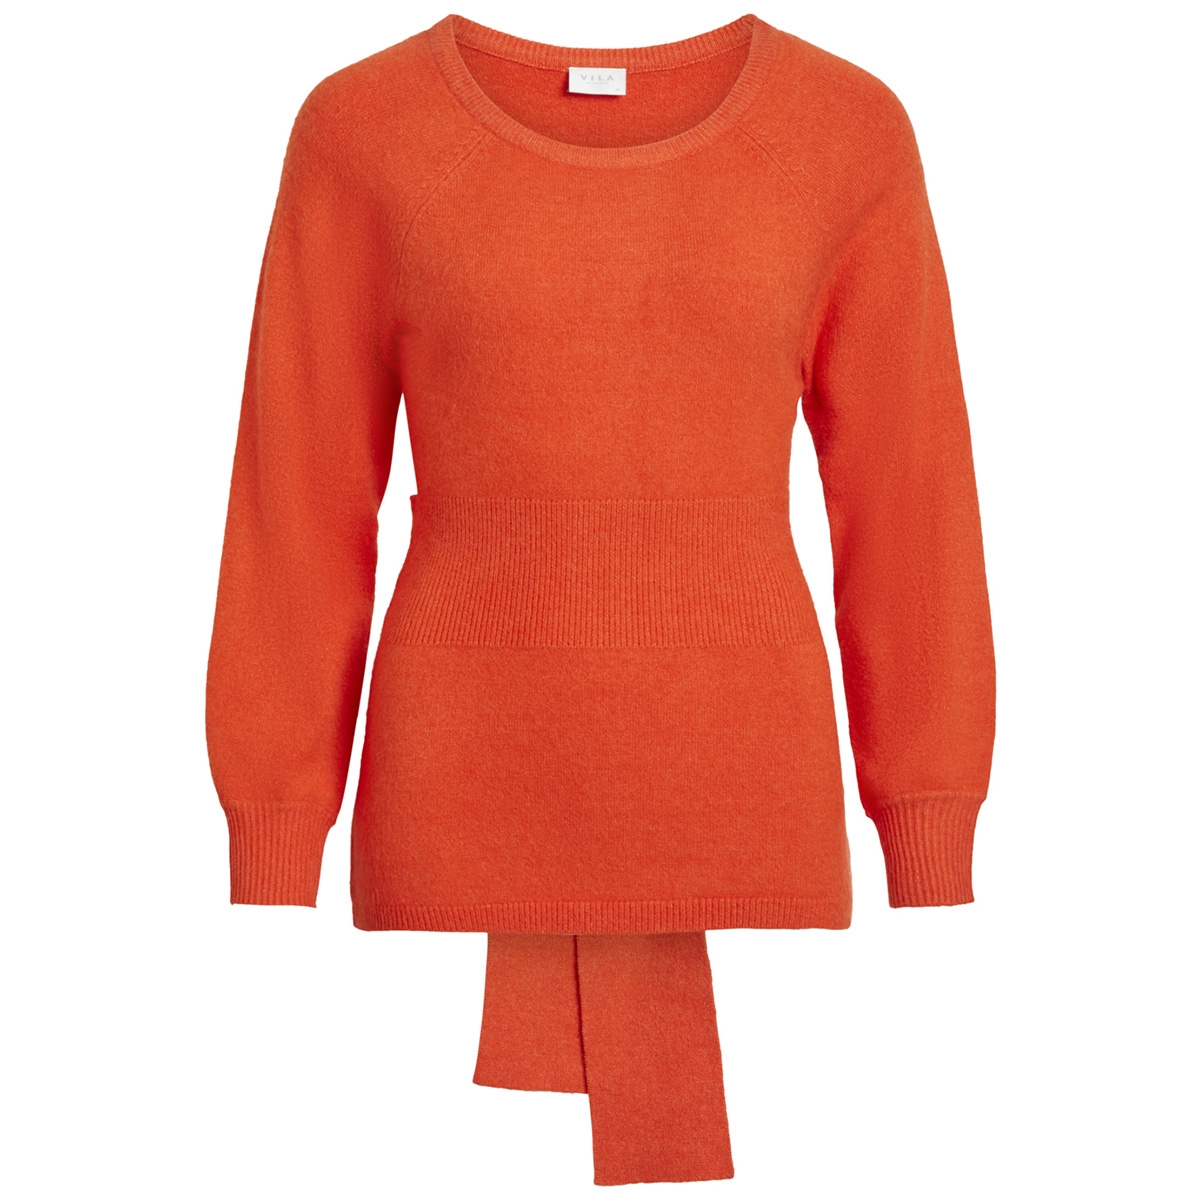 viril knit tie l/s top 14050299 vila trui cherry tomato